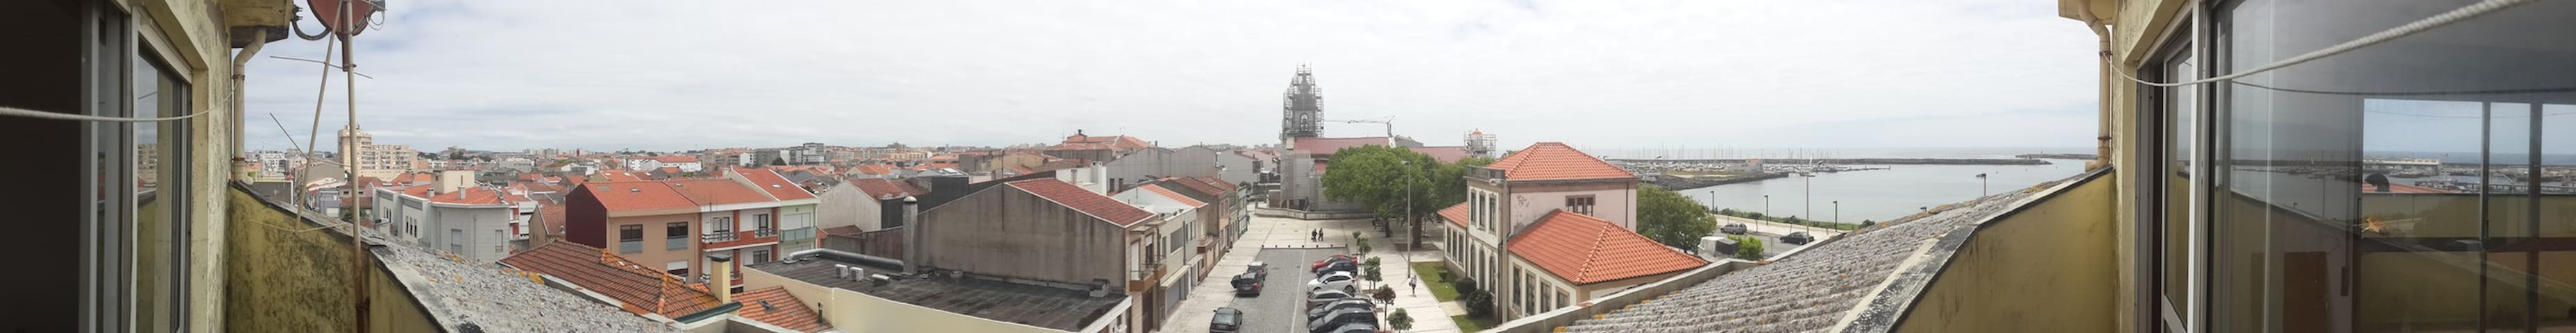 Linden Port - Póvoa de Varzim - Selveierleilighet